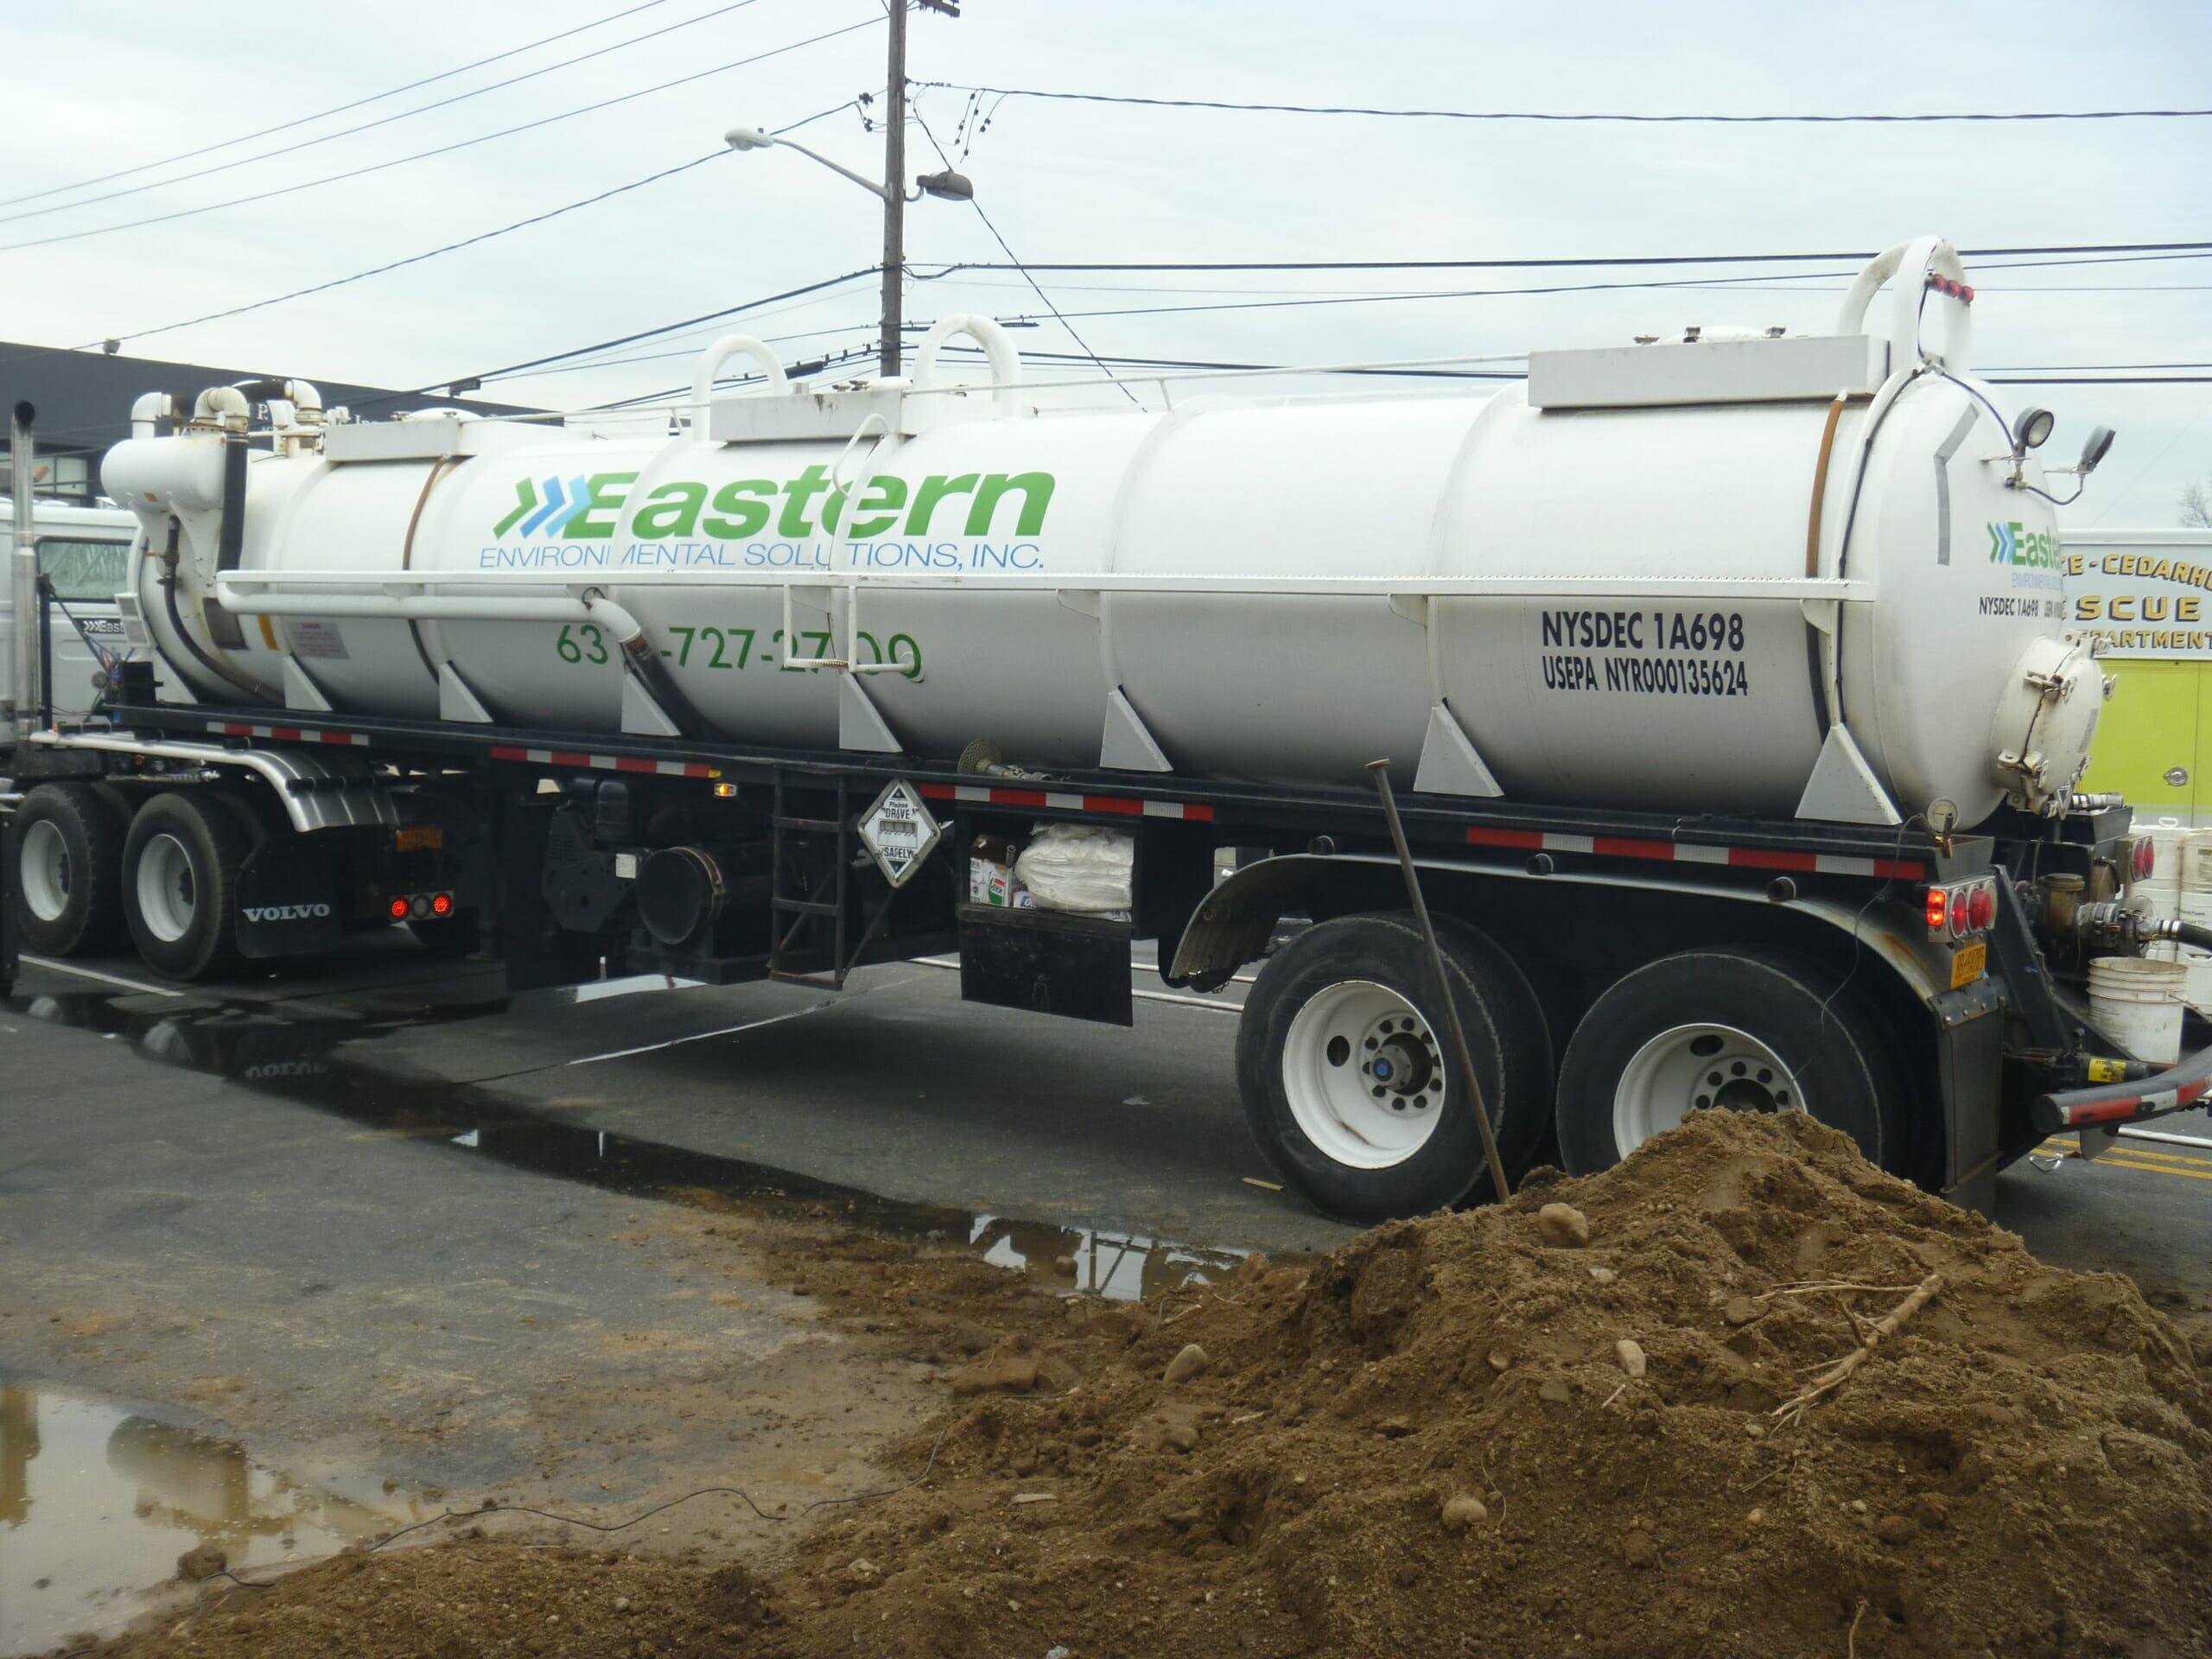 Waste Management, Hazardous & Non-Hazardous Transport, Disposal, Removal